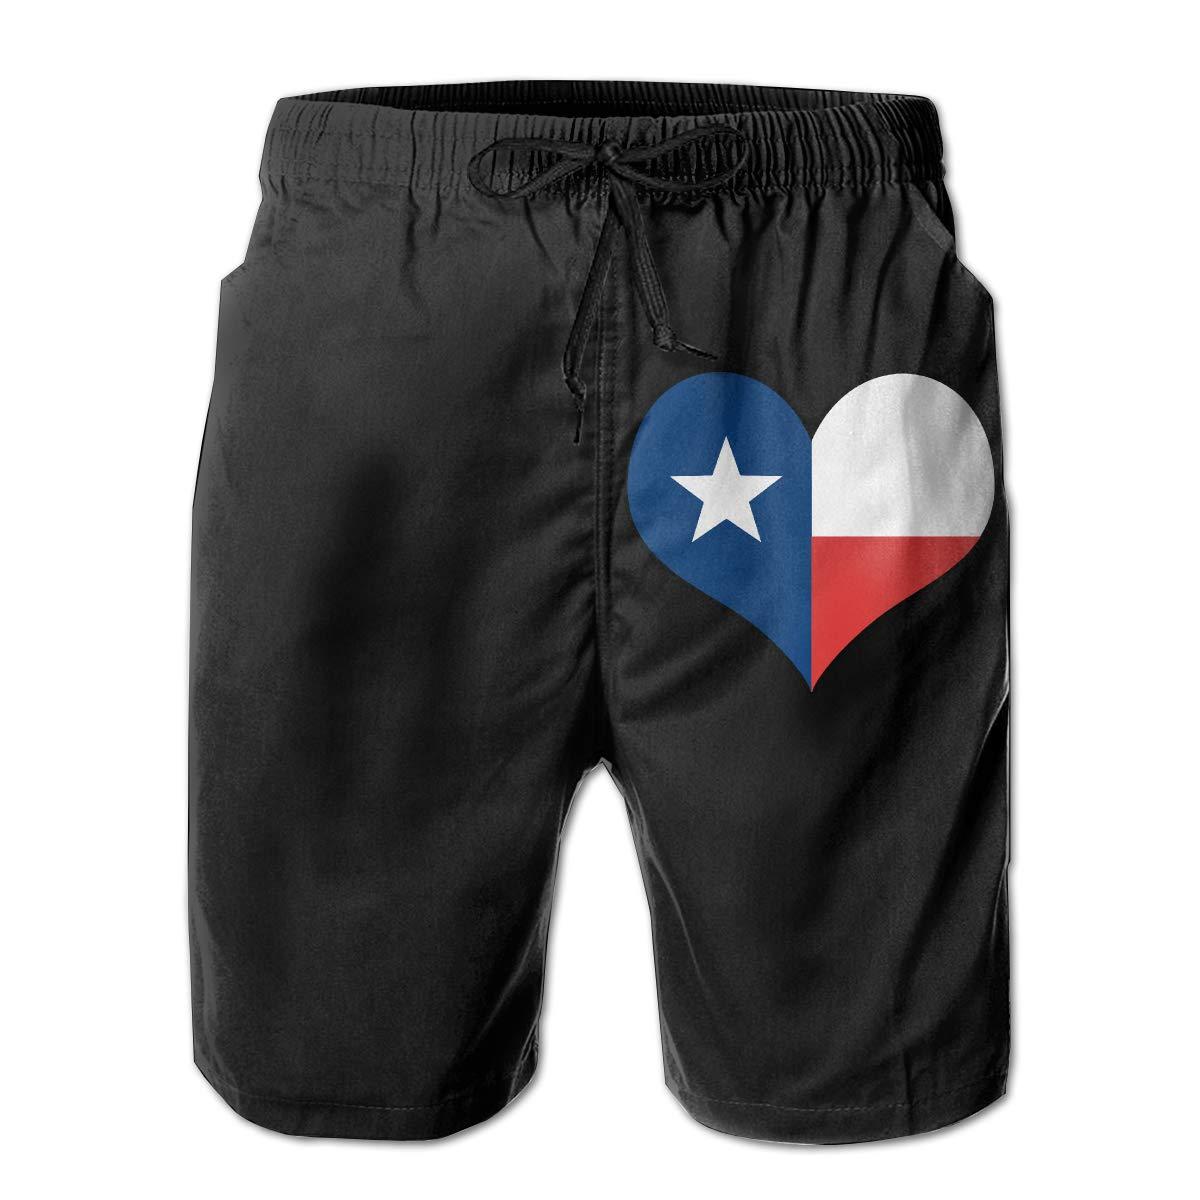 Xk7@KU Mens Athletic Swim Trunks Polyester Texas Flag Heart Board Shorts with Pockets